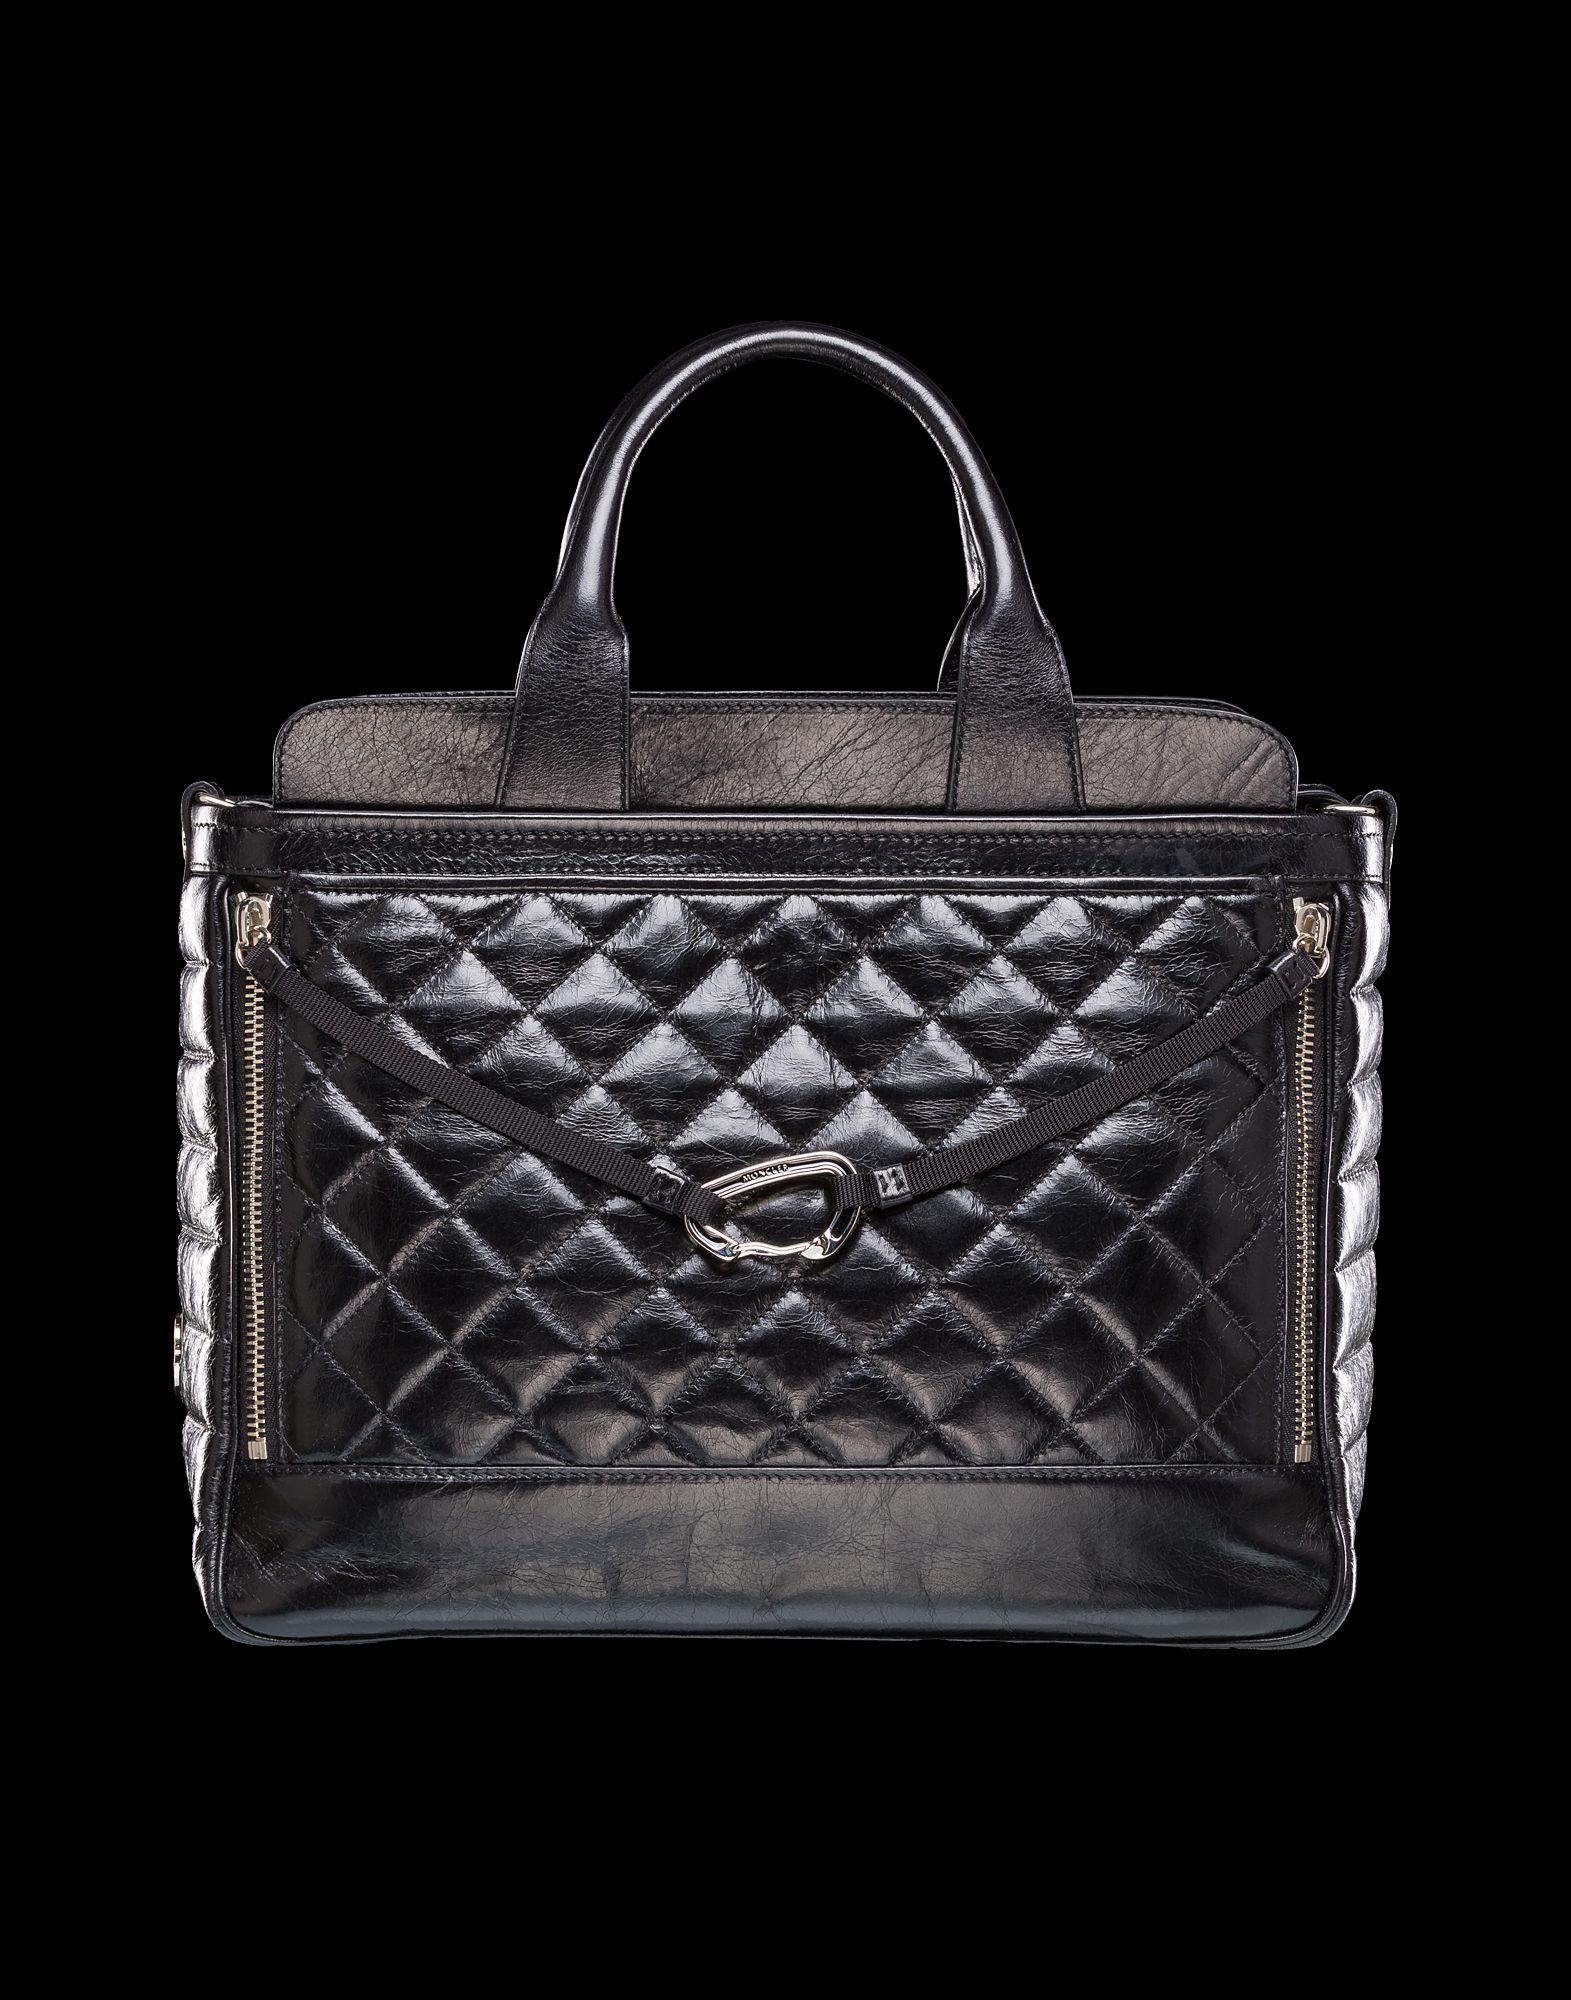 Handbags Women On Moncler Online The Carole Handbag